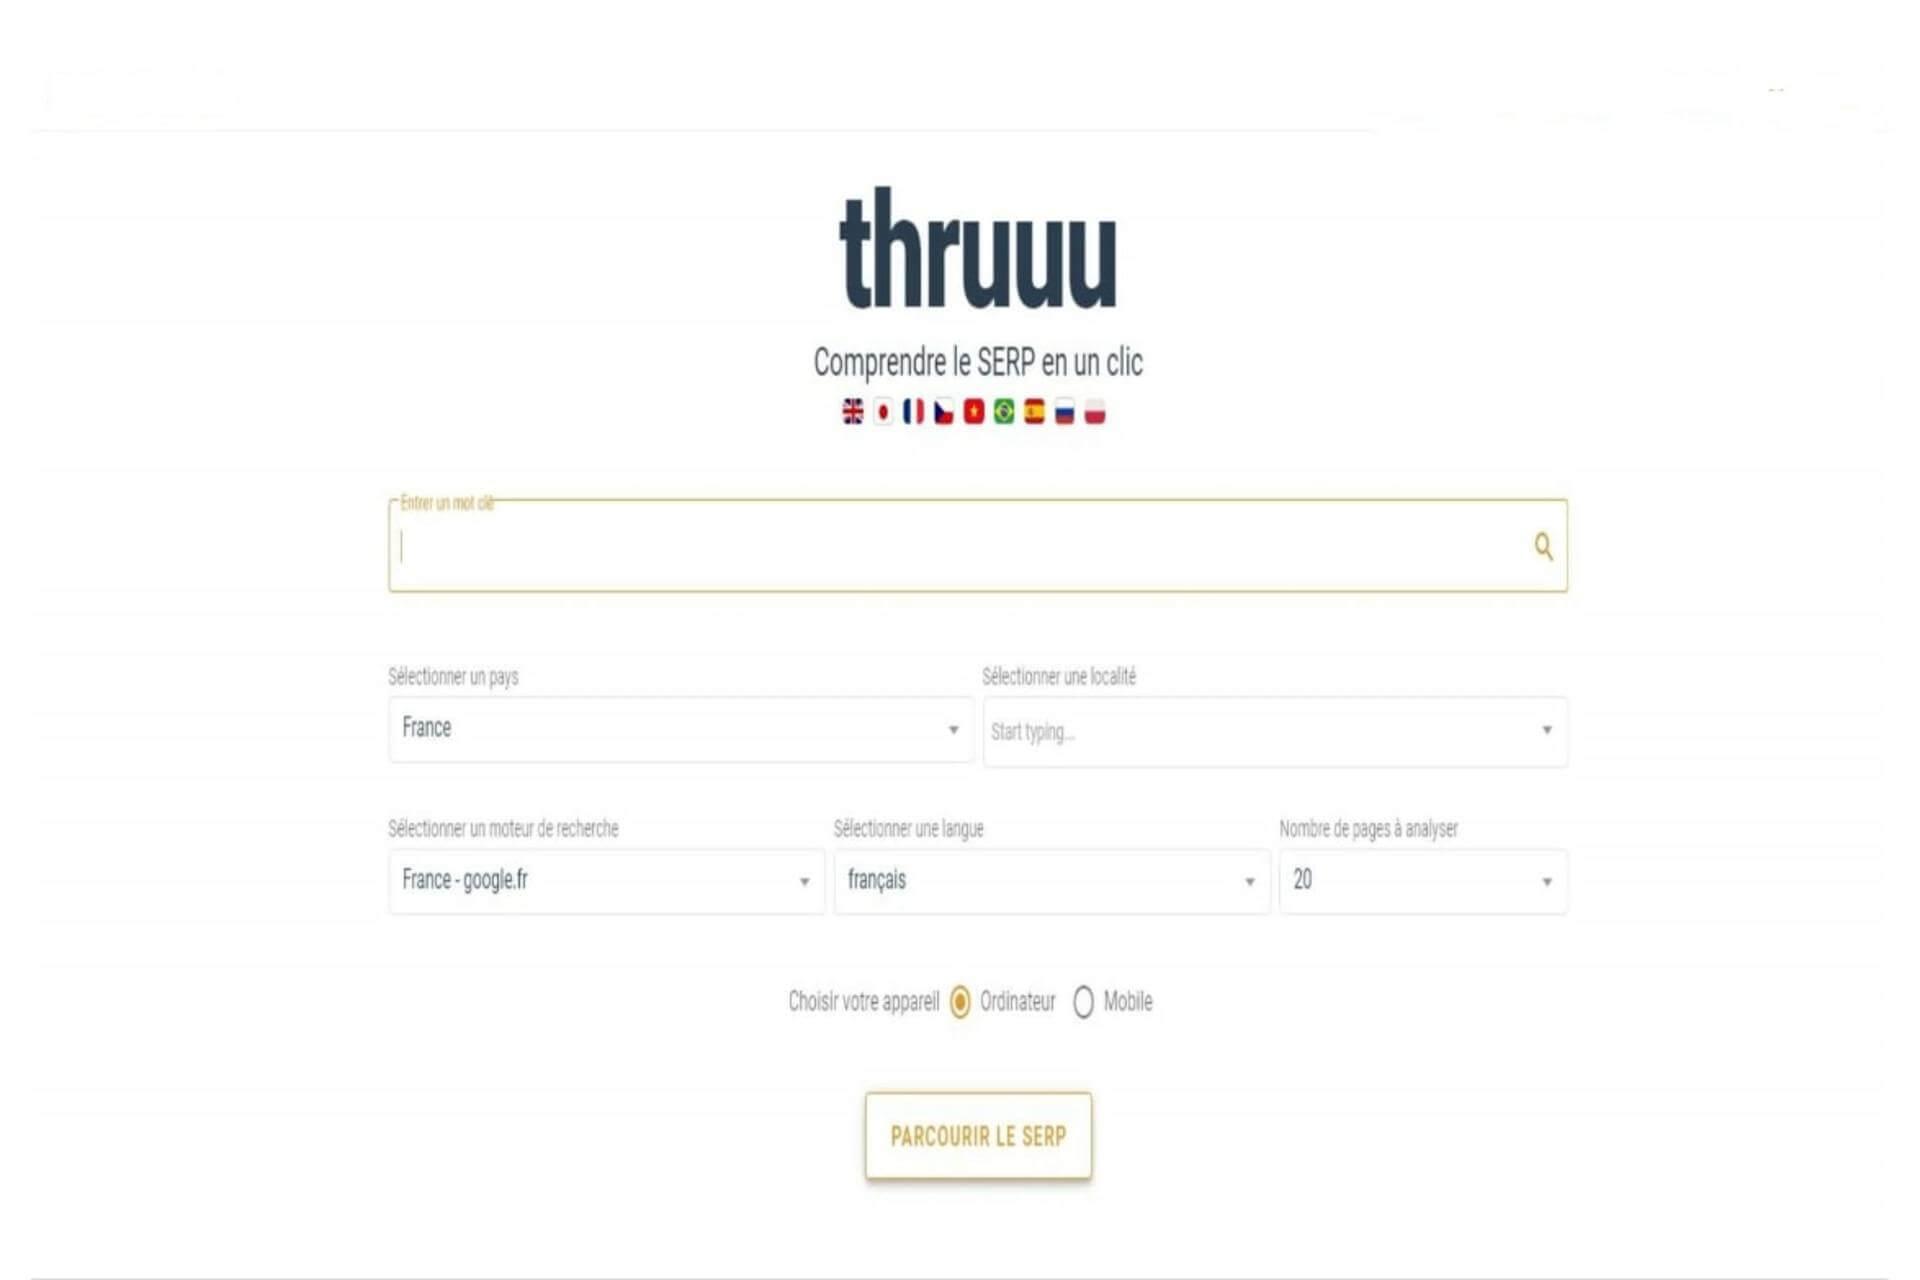 Thruuu : l'analyseur de la SERP de Google